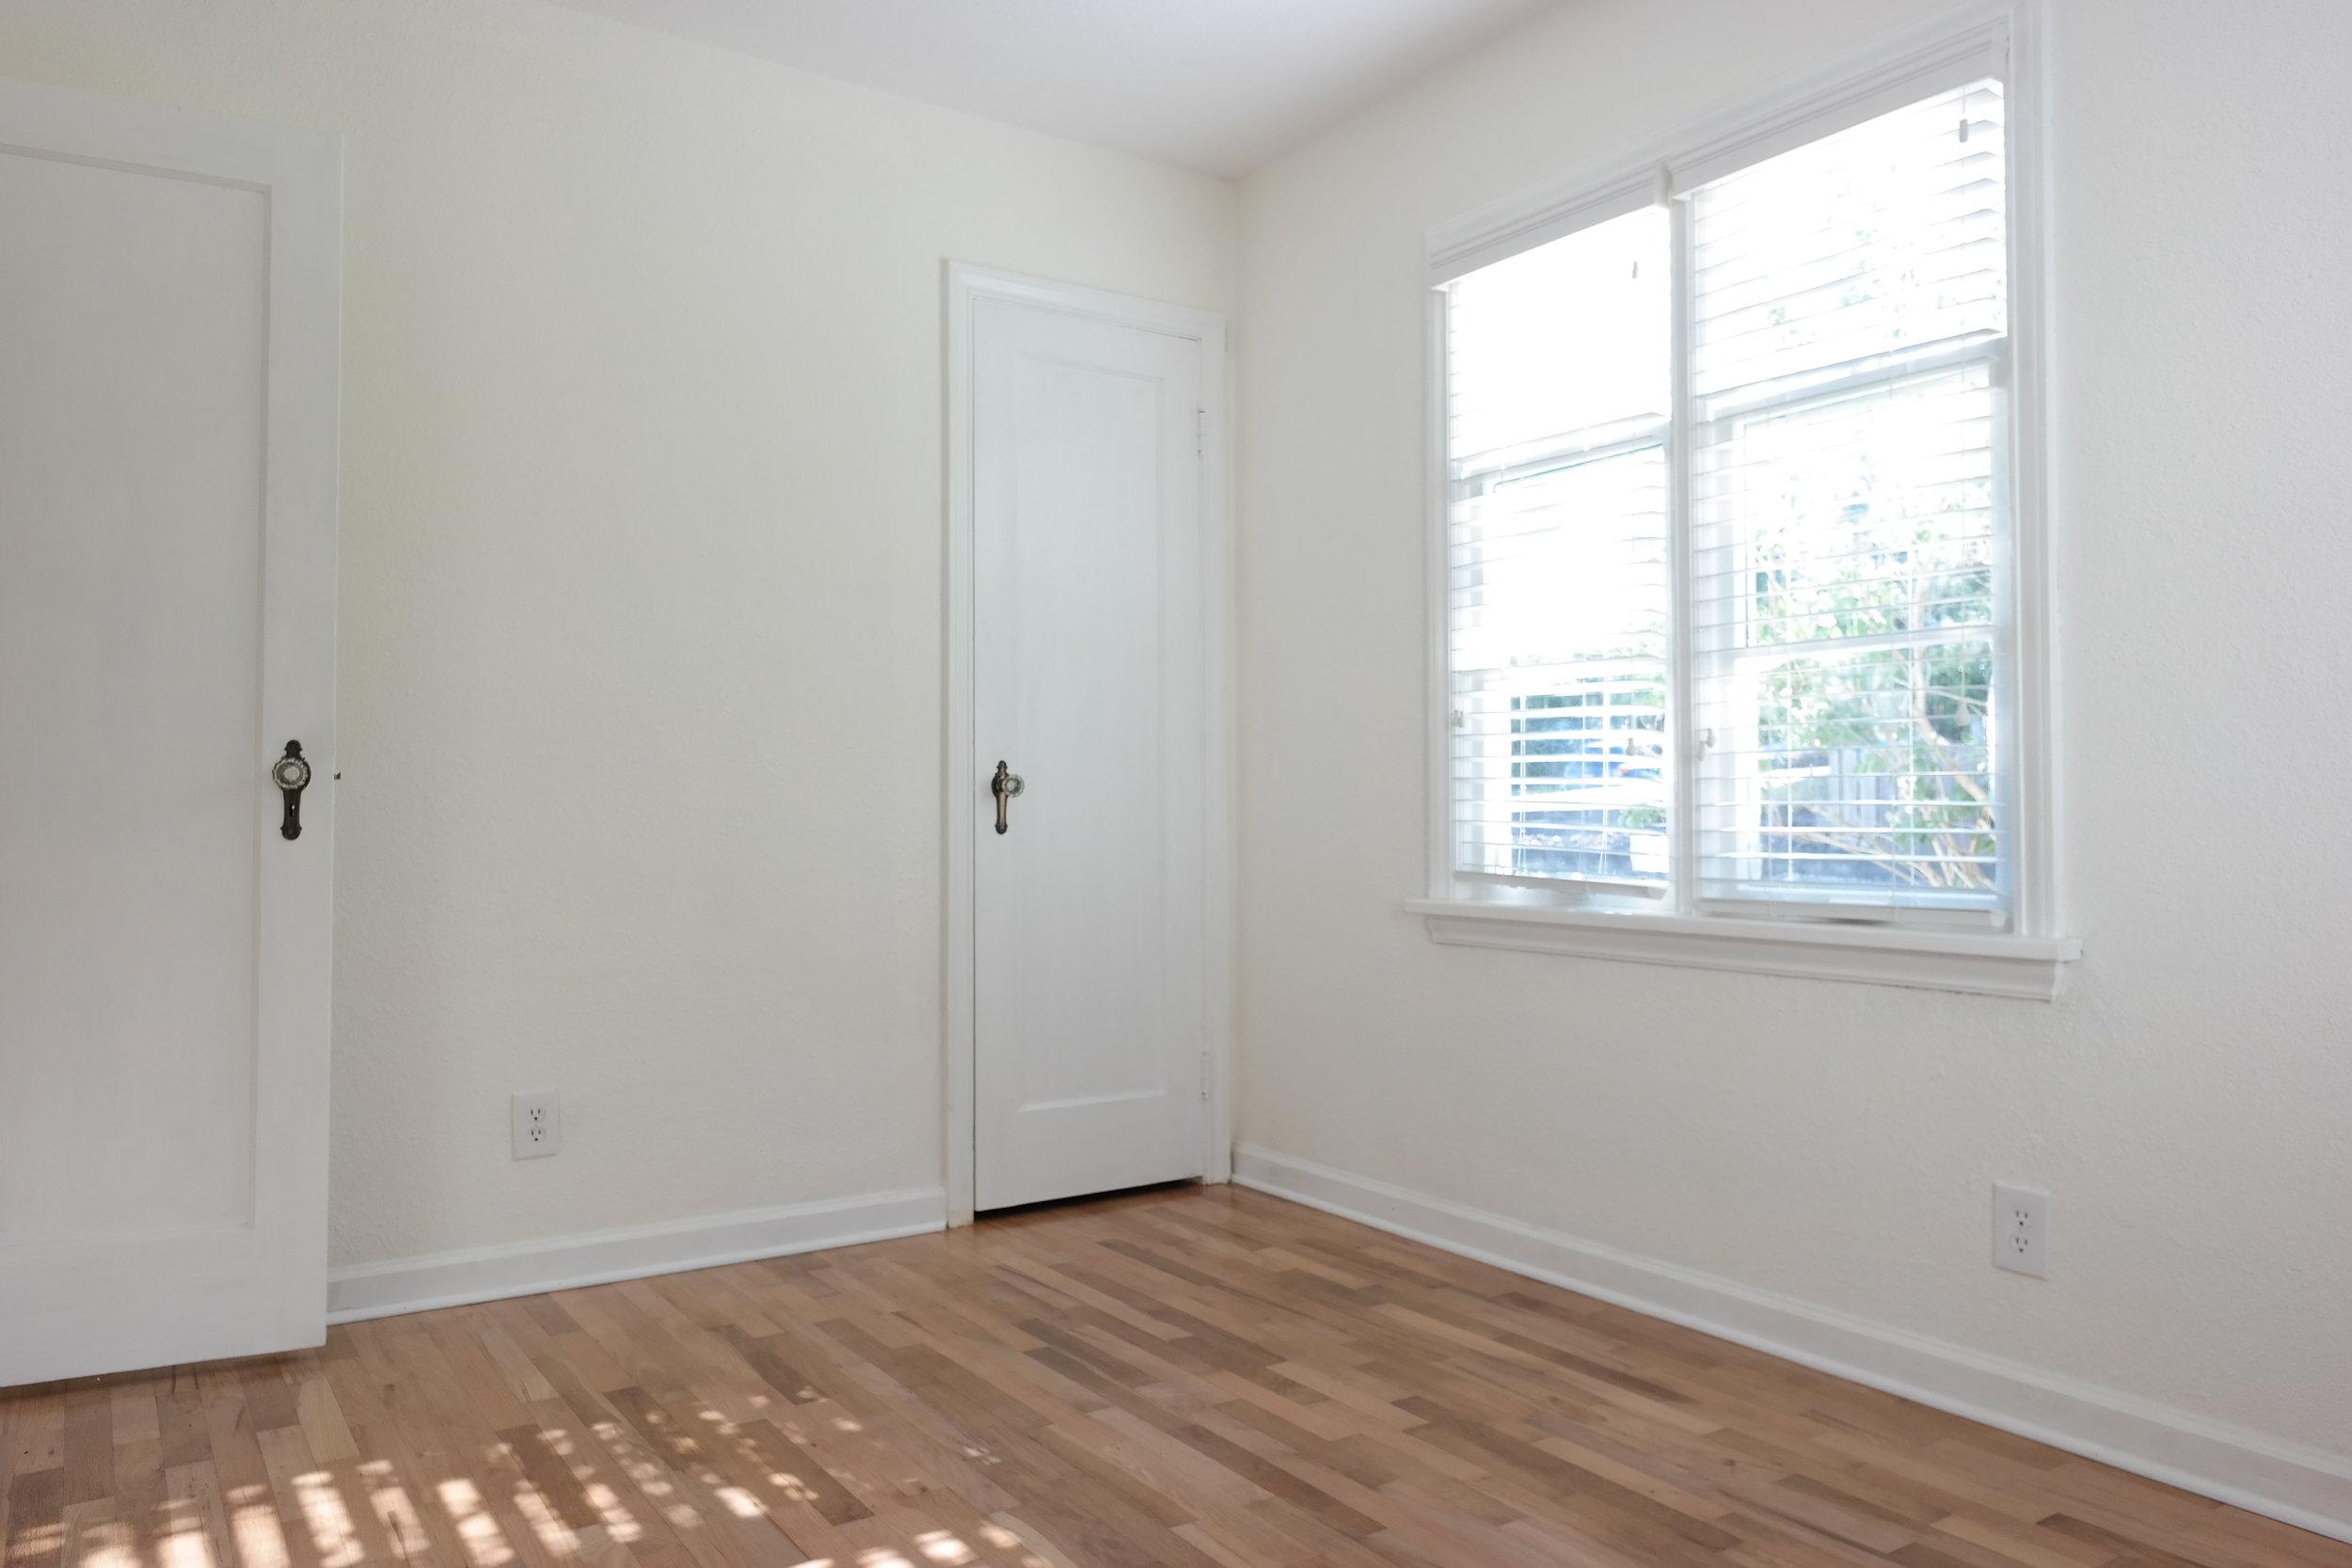 12-Bedroom203.JPG